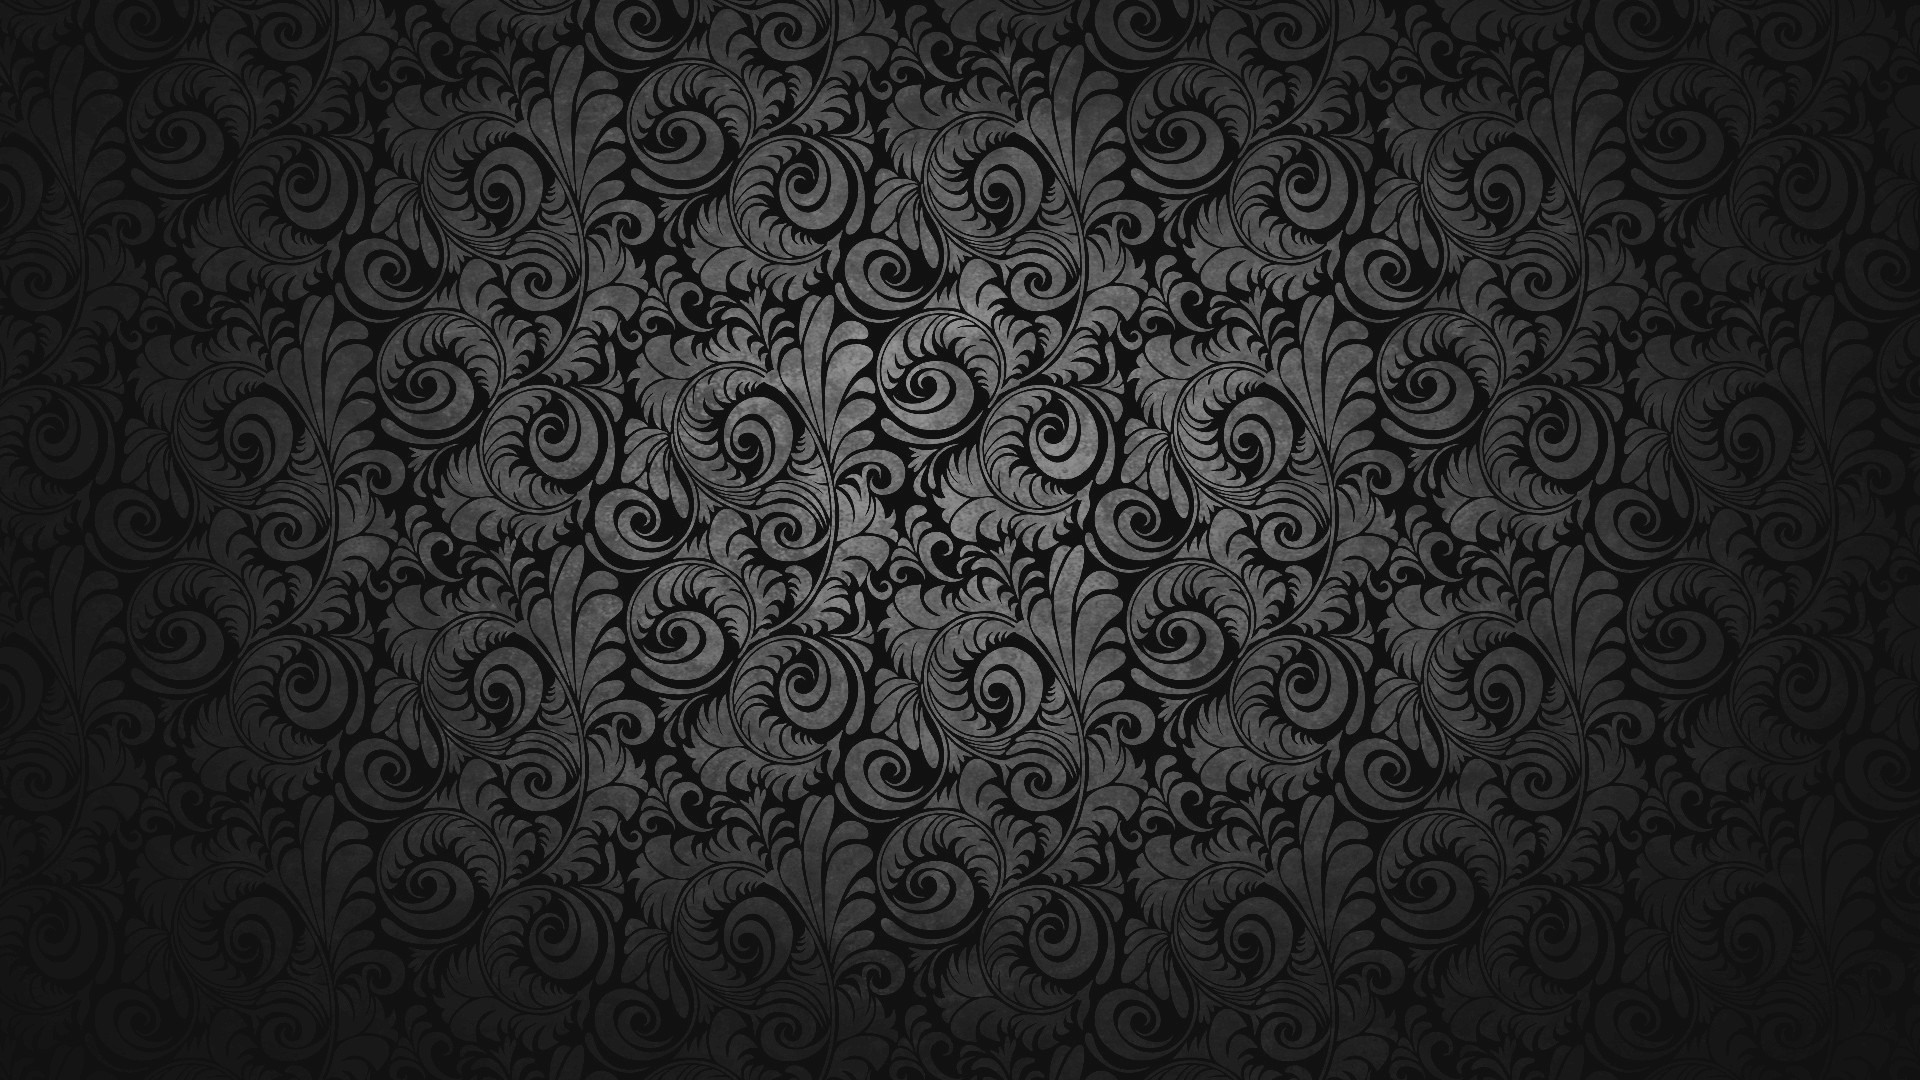 Architecture Floral Black Dark 556183 Wallpaper wallpaper